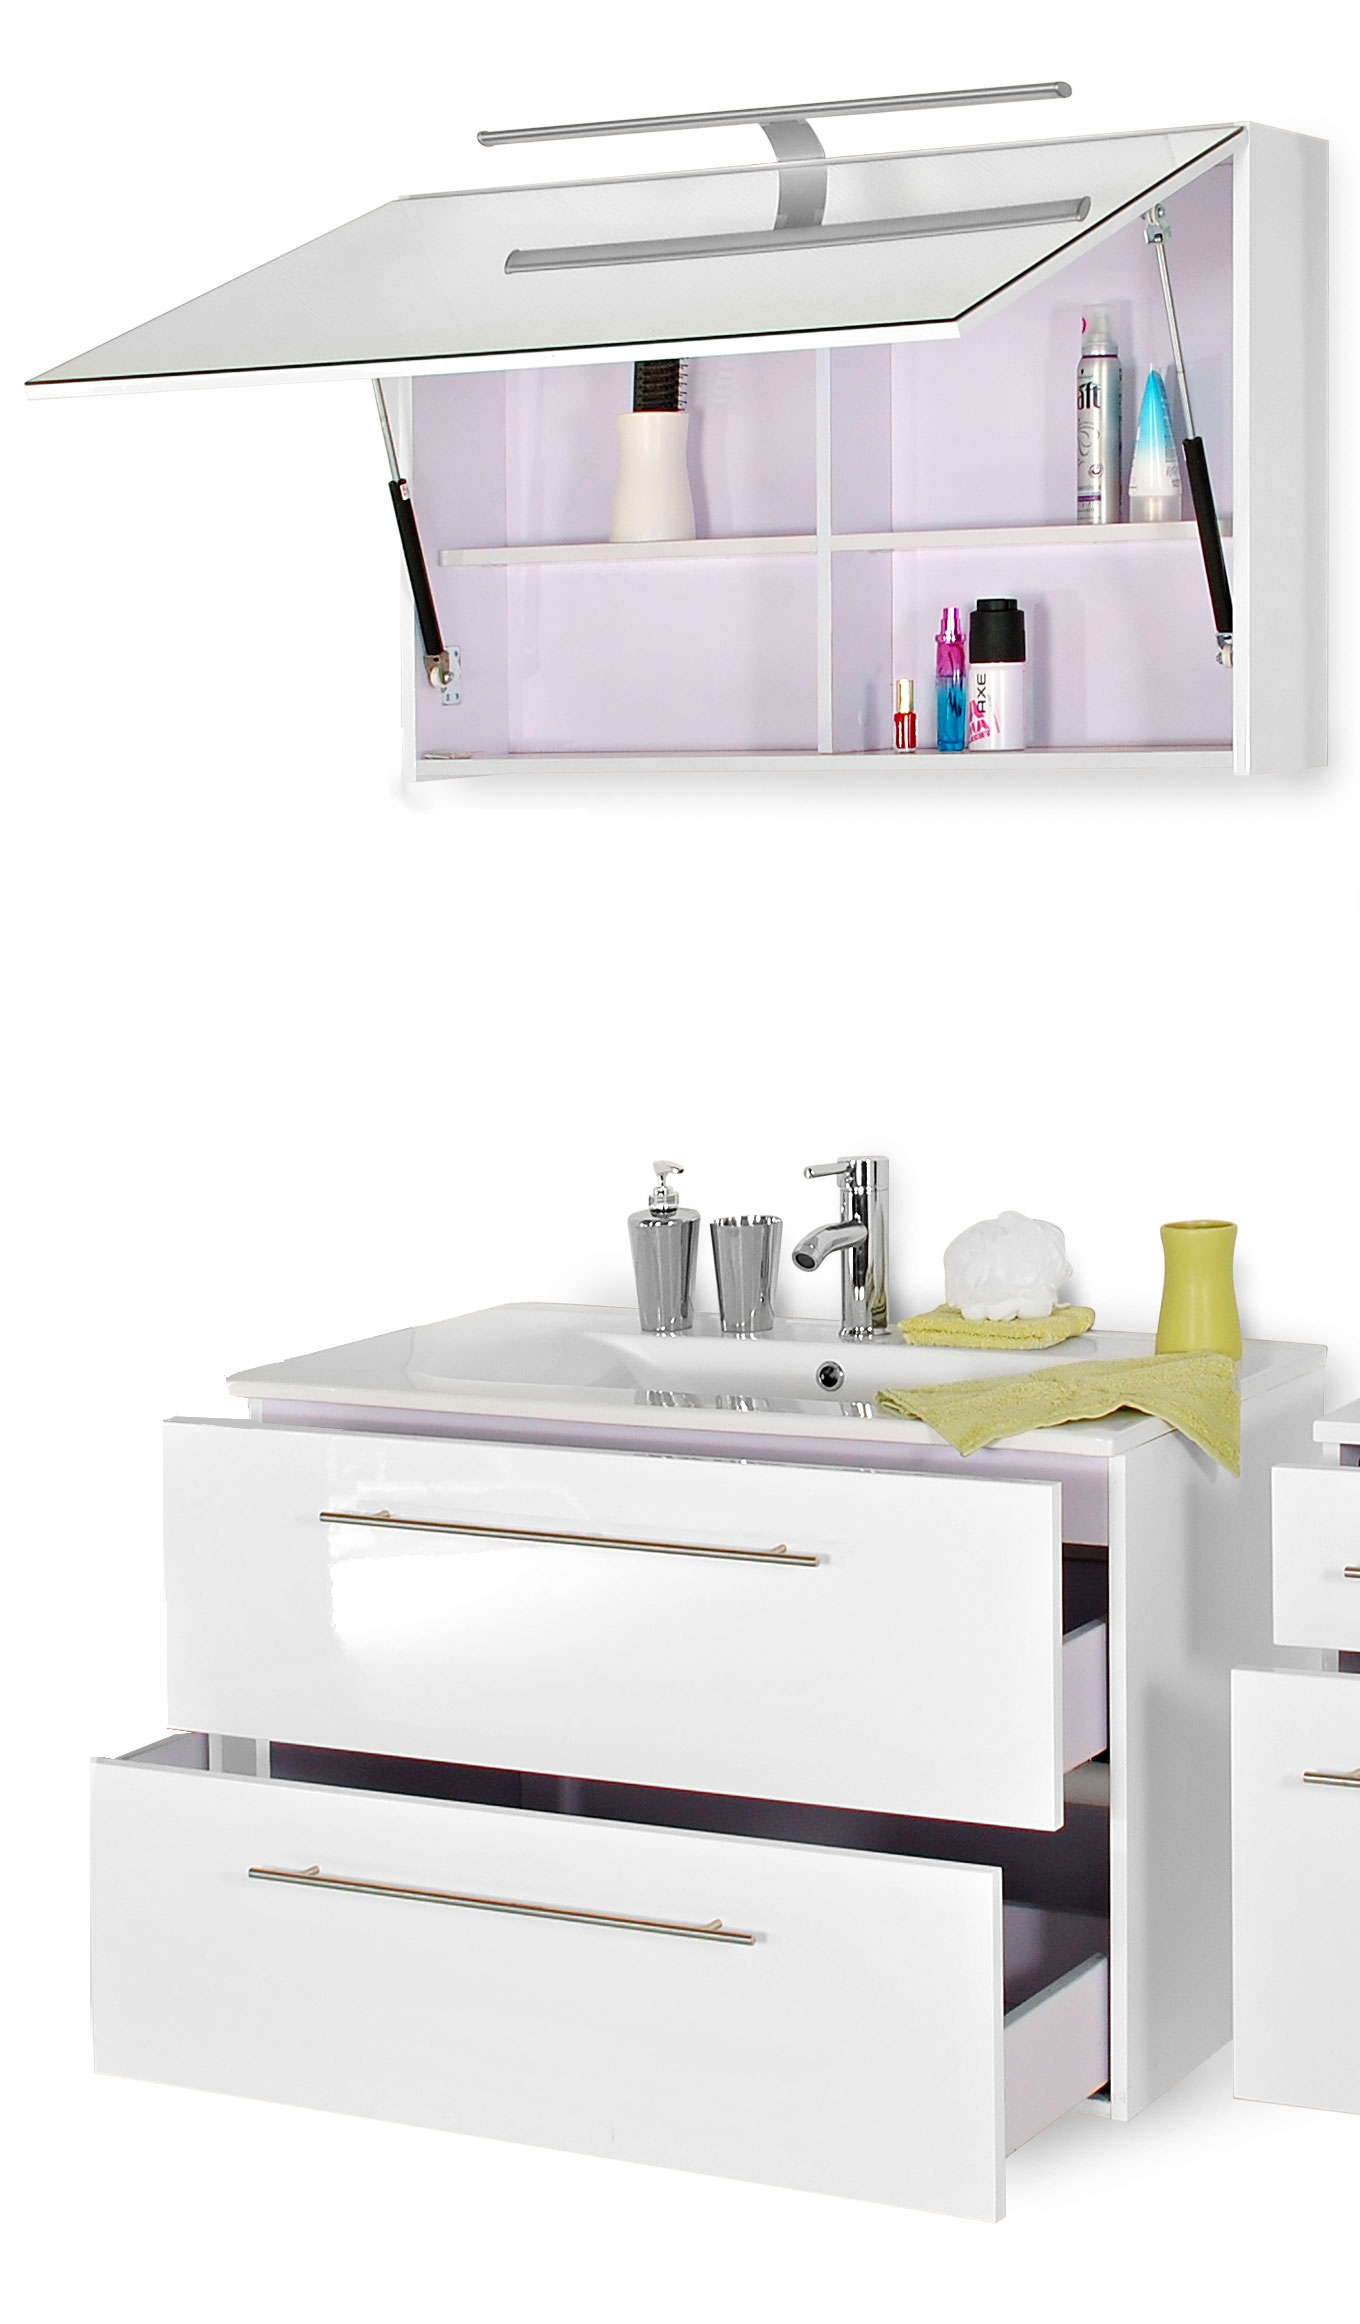 sam badm bel set 2tlg wei 90cm spiegelschrank deluxe rimini demn chst. Black Bedroom Furniture Sets. Home Design Ideas